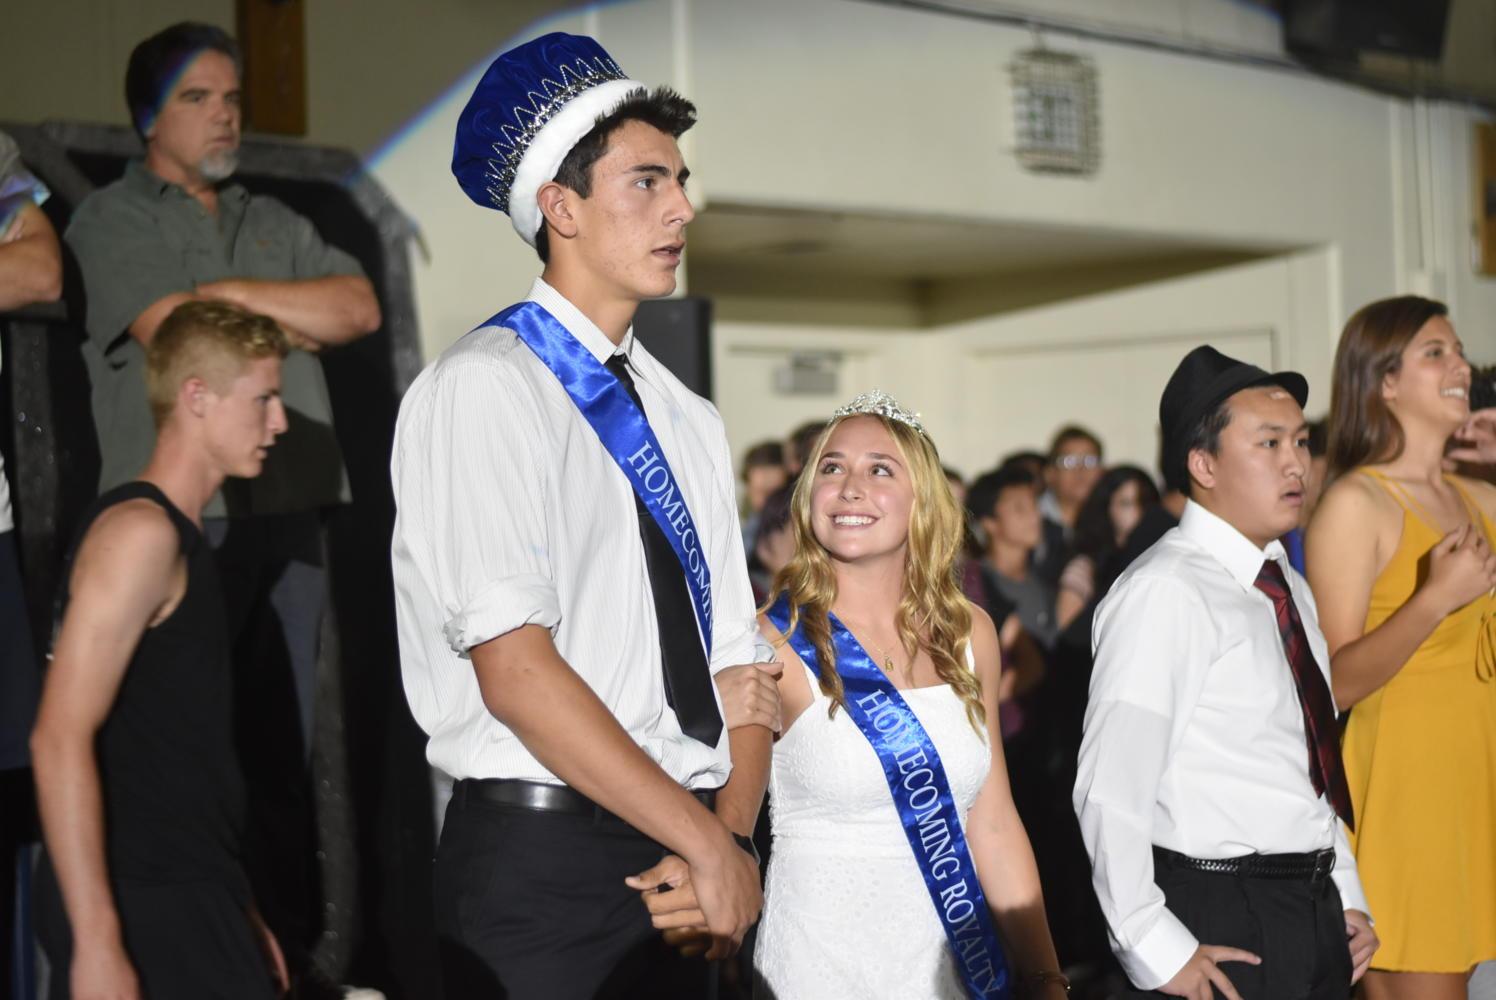 Ciera Muscarella, junior homecoming princess, looks up at Jamie Jaquez, junior homecoming prince.